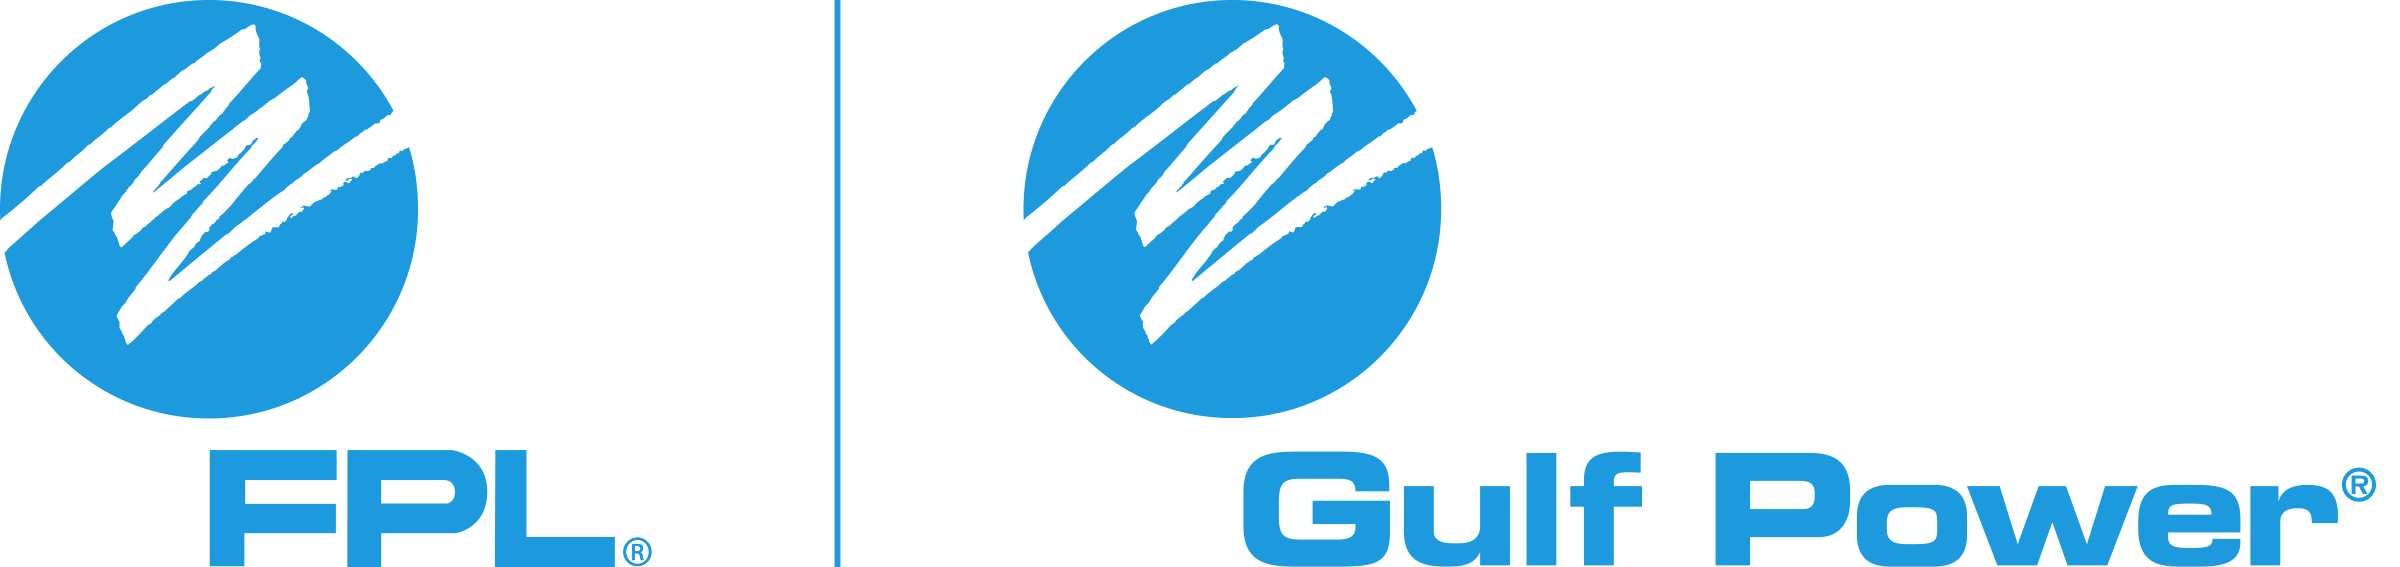 Florida Power and Light | Gulf Power logo